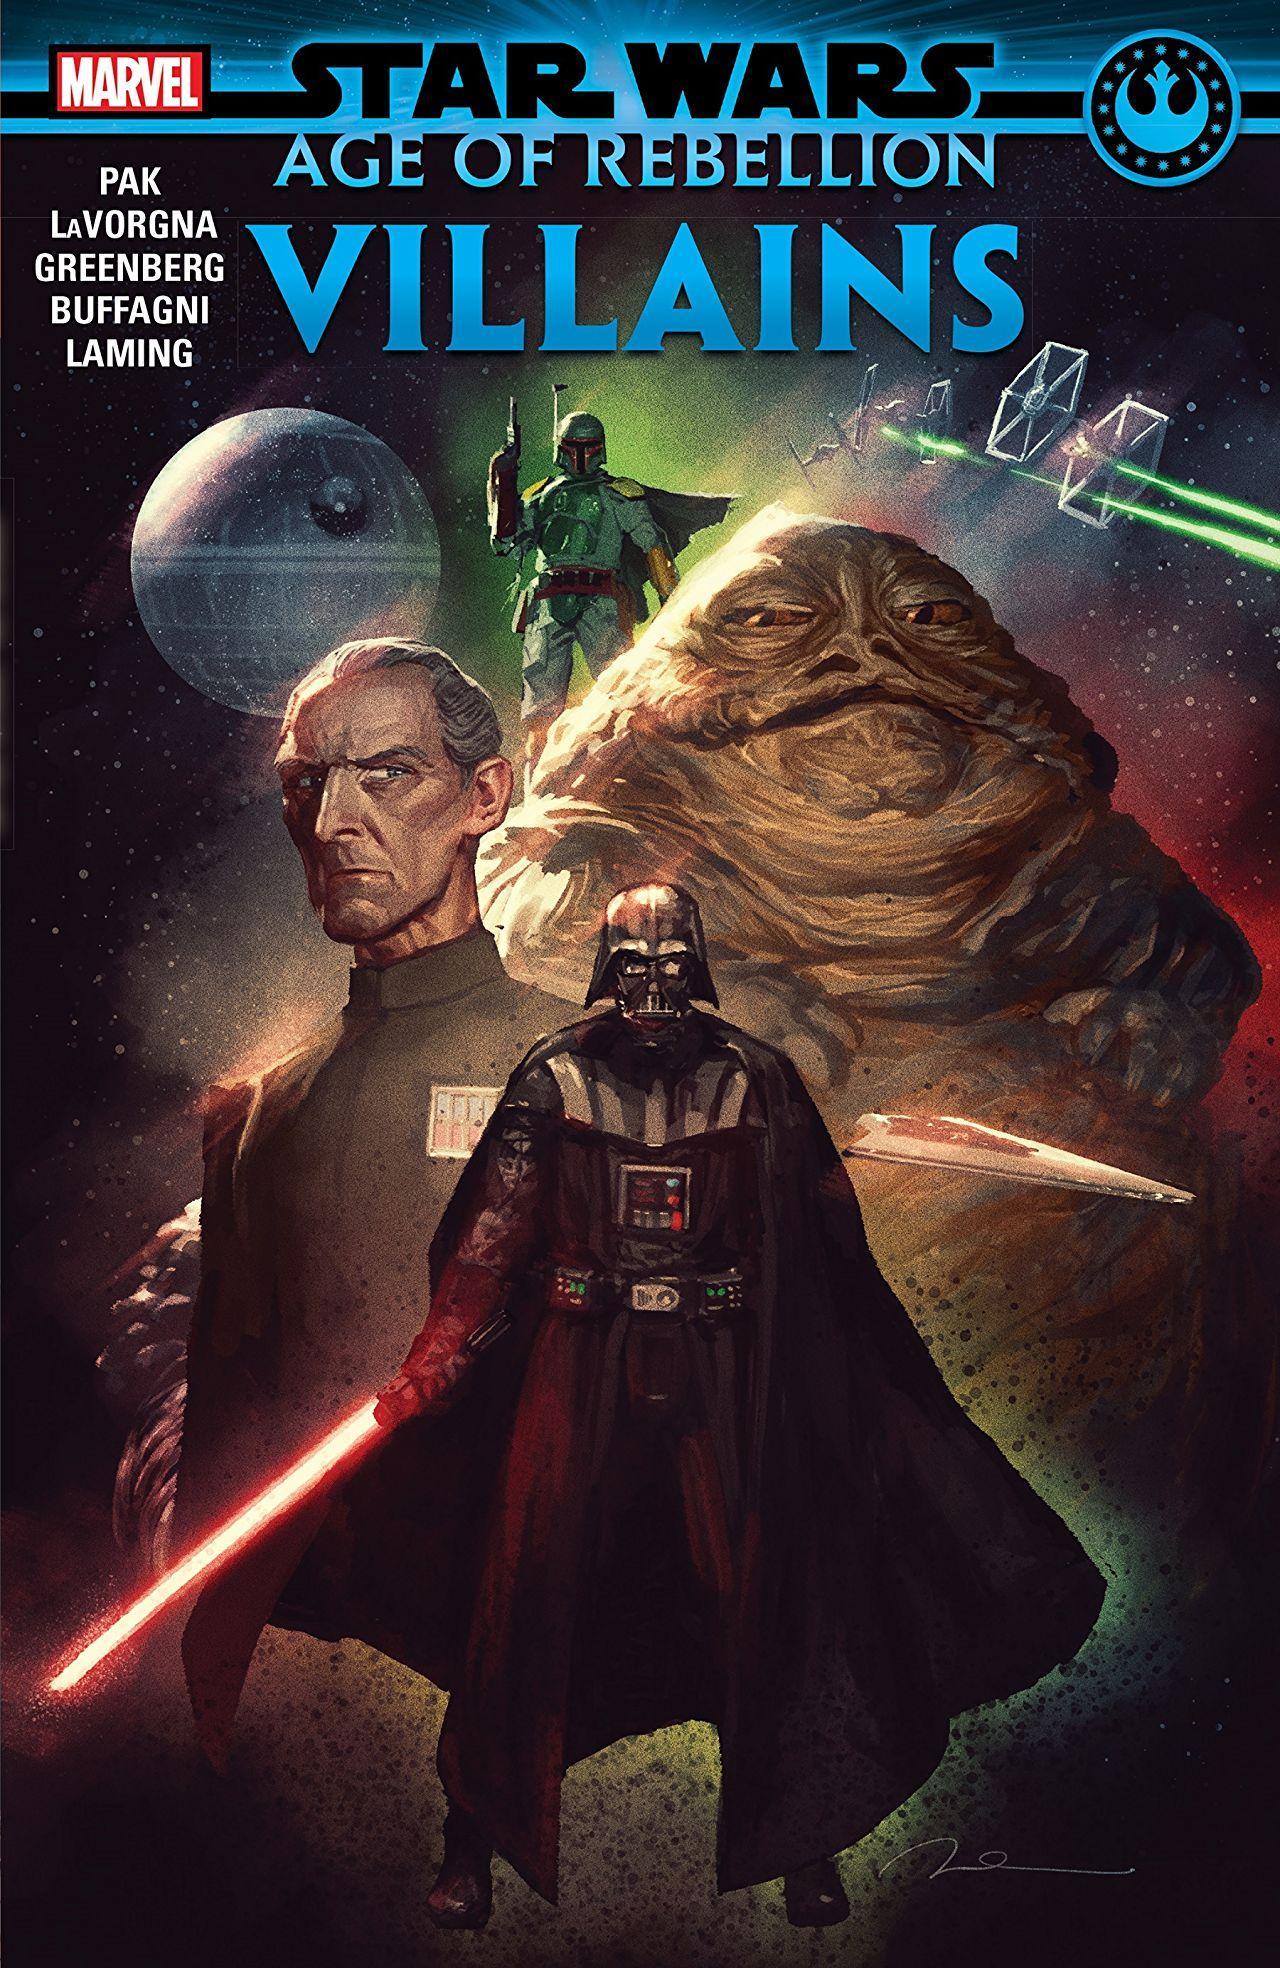 Star Wars Age of Rebellion - Villains